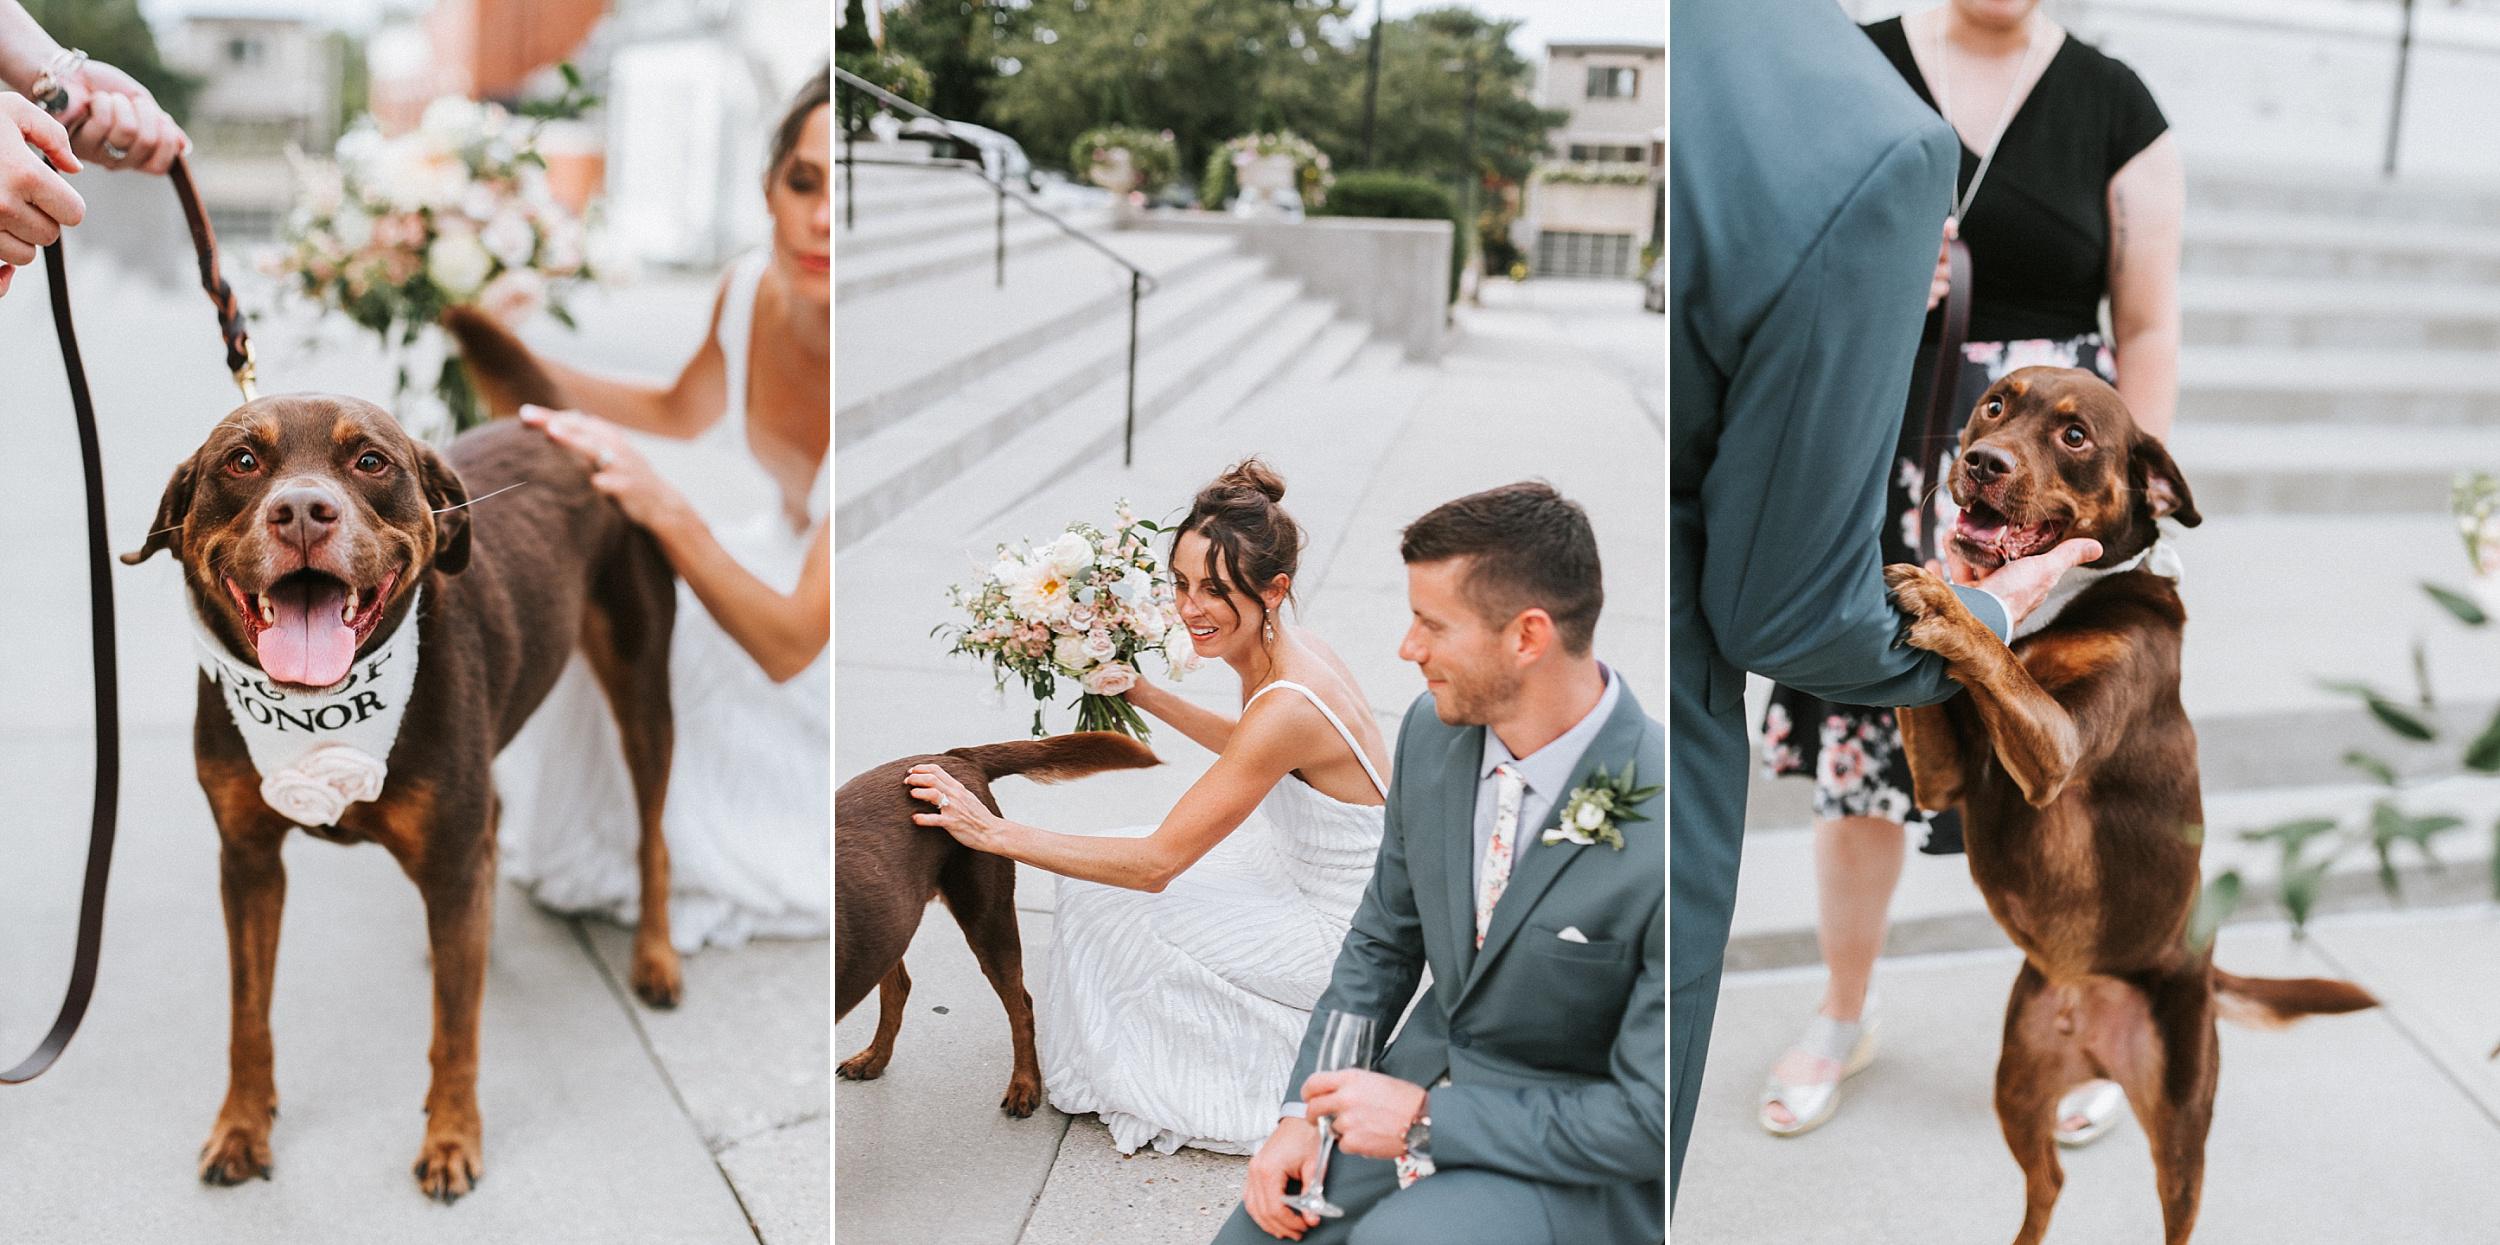 Brooke Townsend Photography - Cincinnati Wedding Photographer (134 of 170).jpg